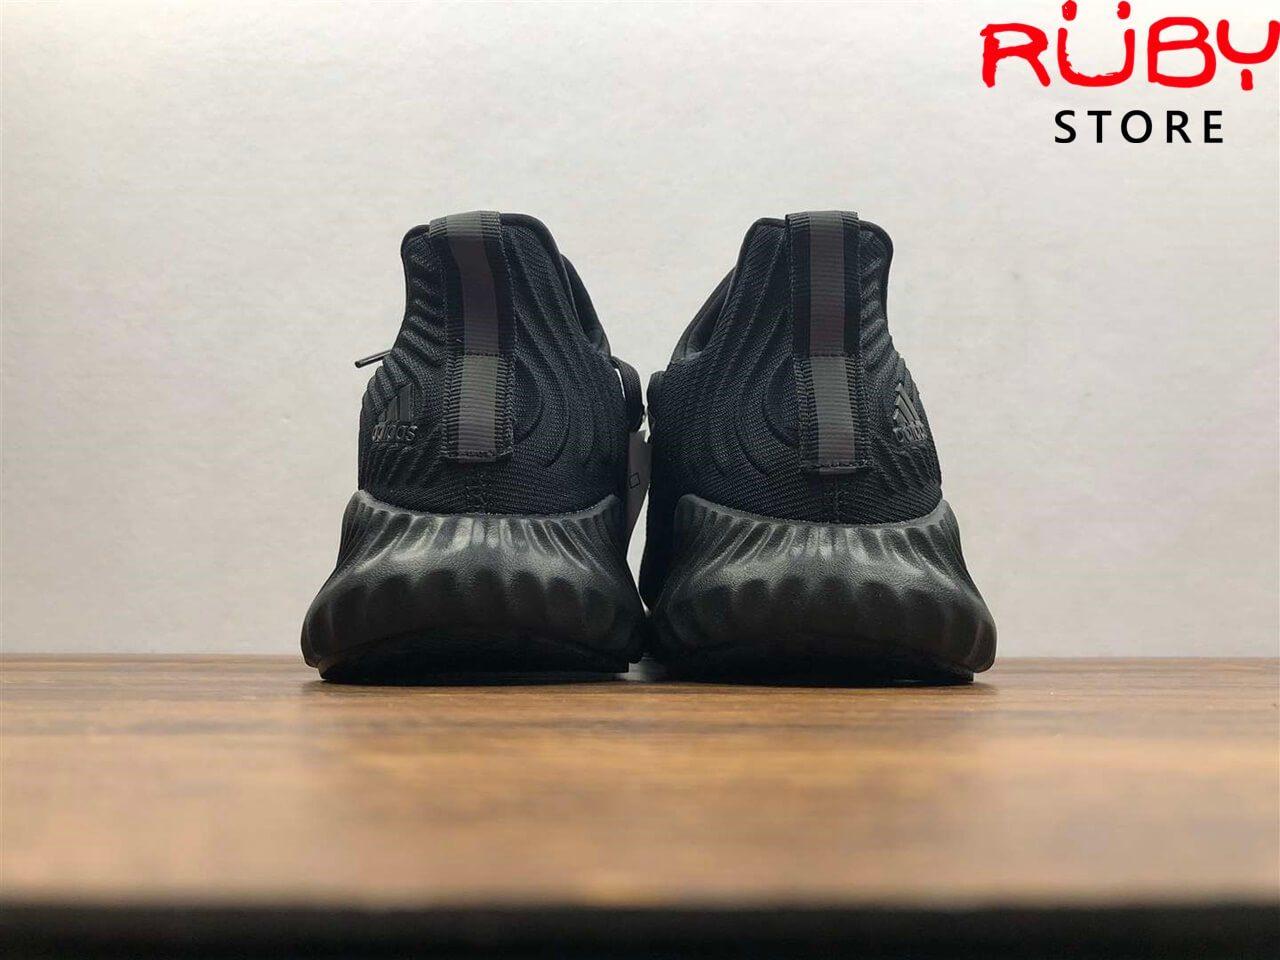 giày-alphabounce-instinct-đen-full-replica-11-ở-hcm (5)